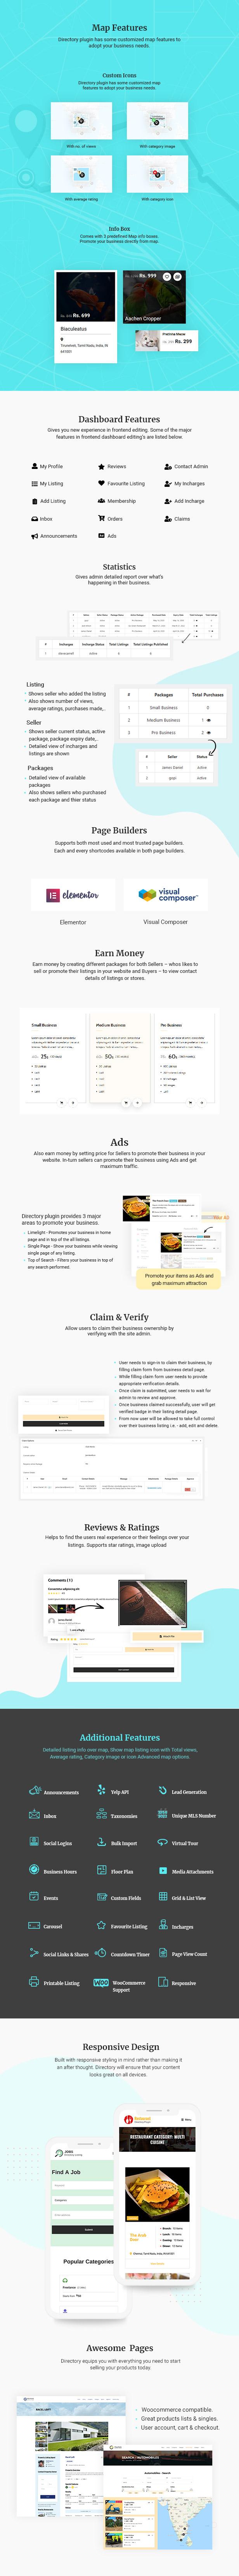 DT - Directory WordPress Plugin - 3